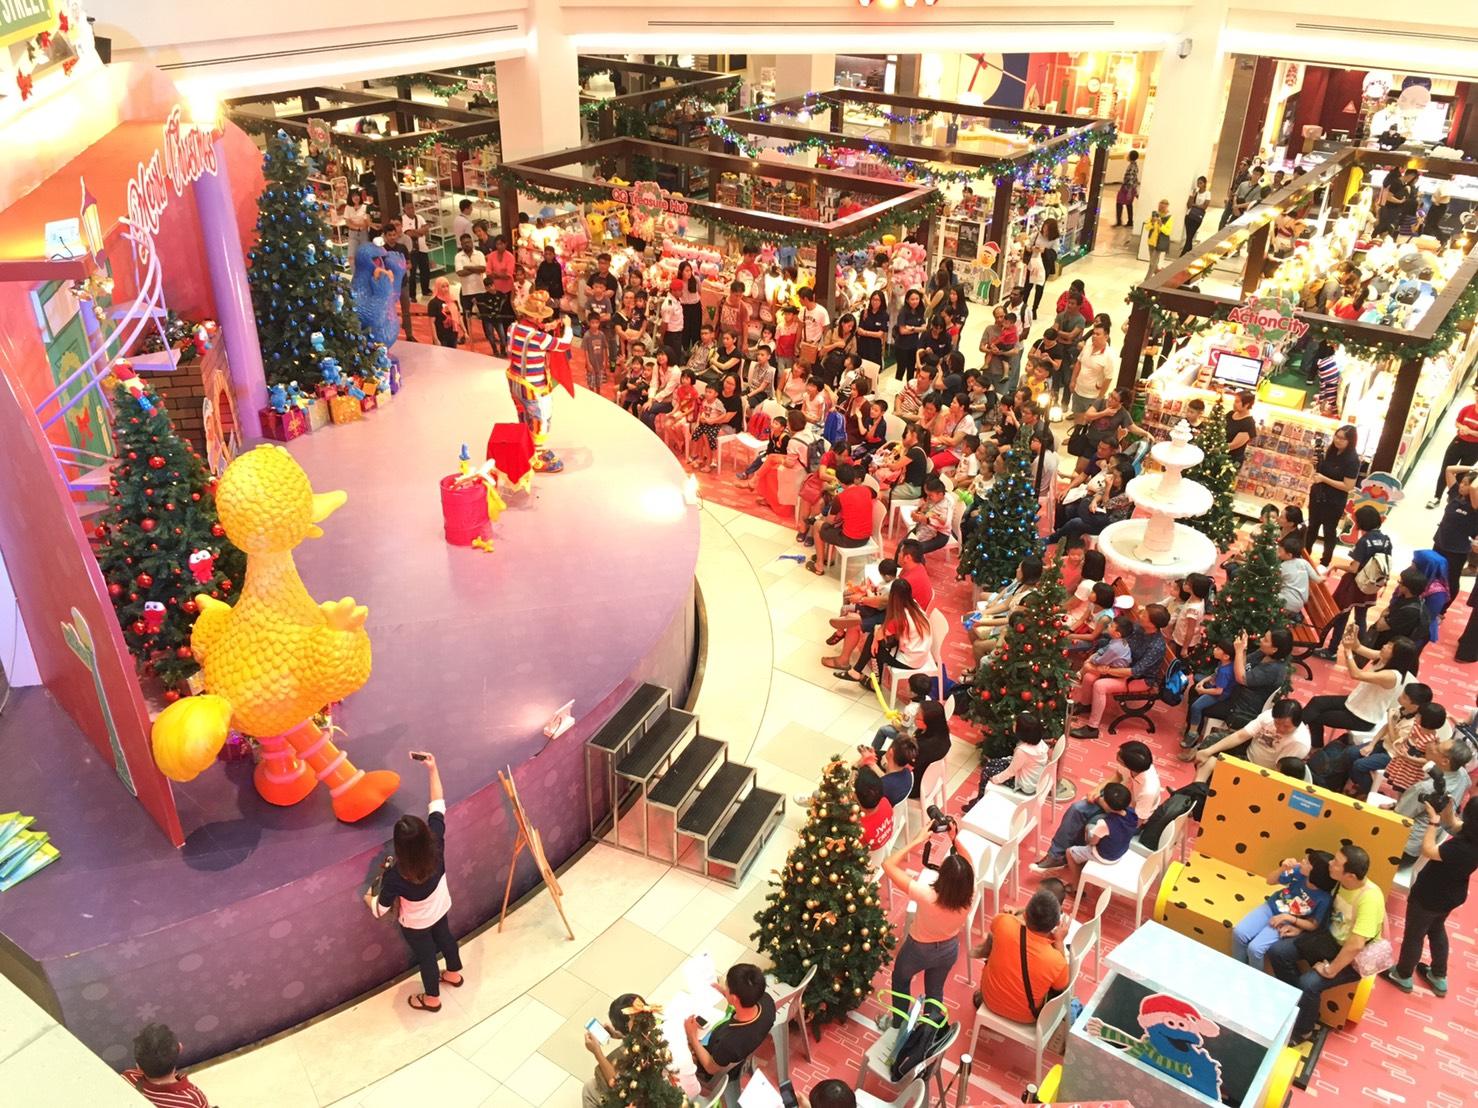 City Square Christmas day